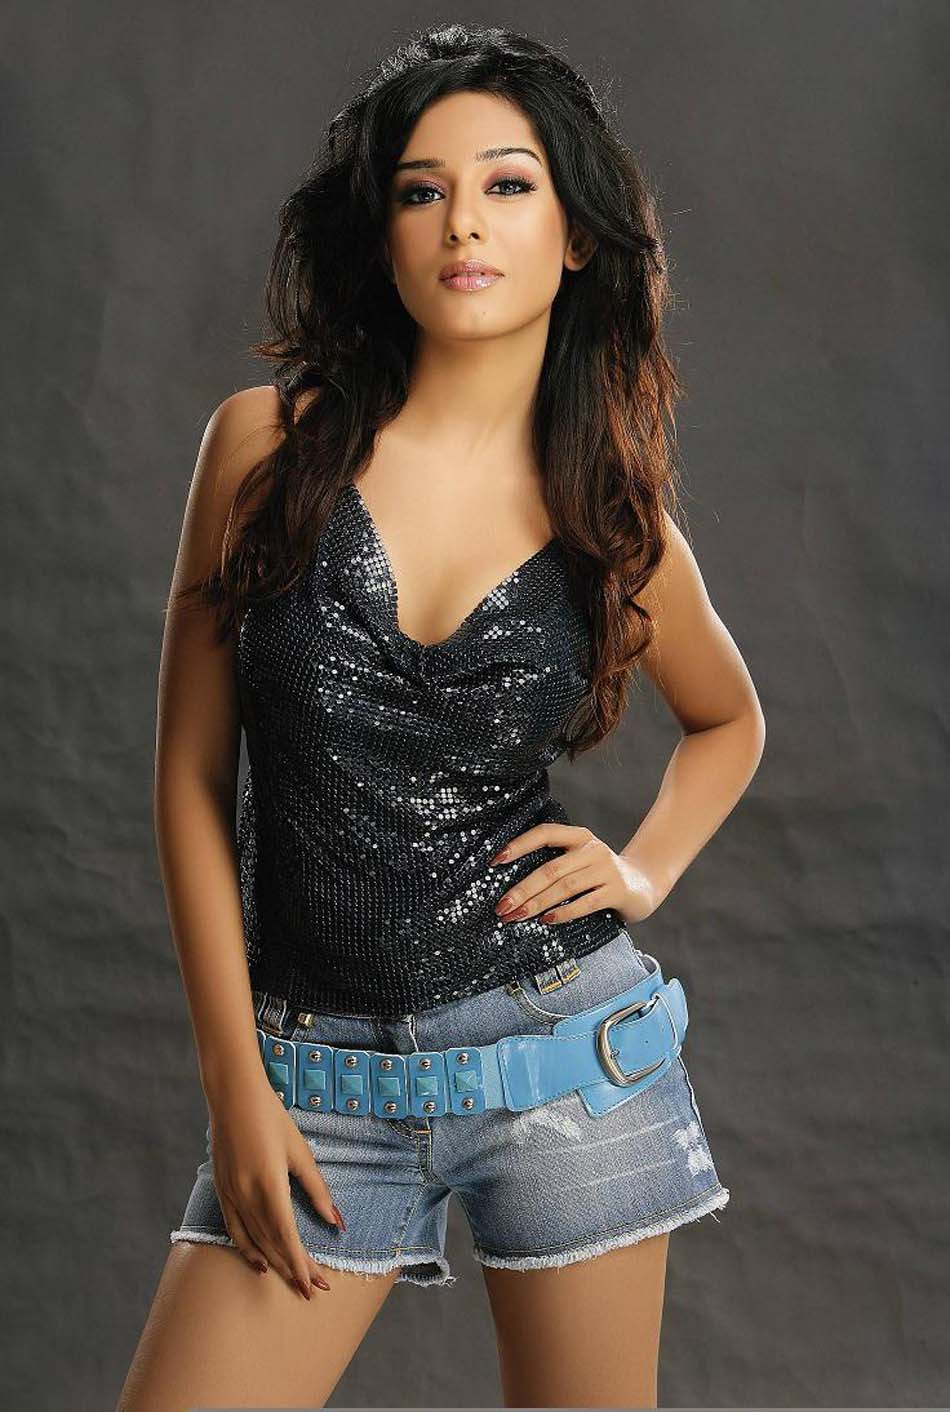 Amritha Rao Sexy Gallary 62